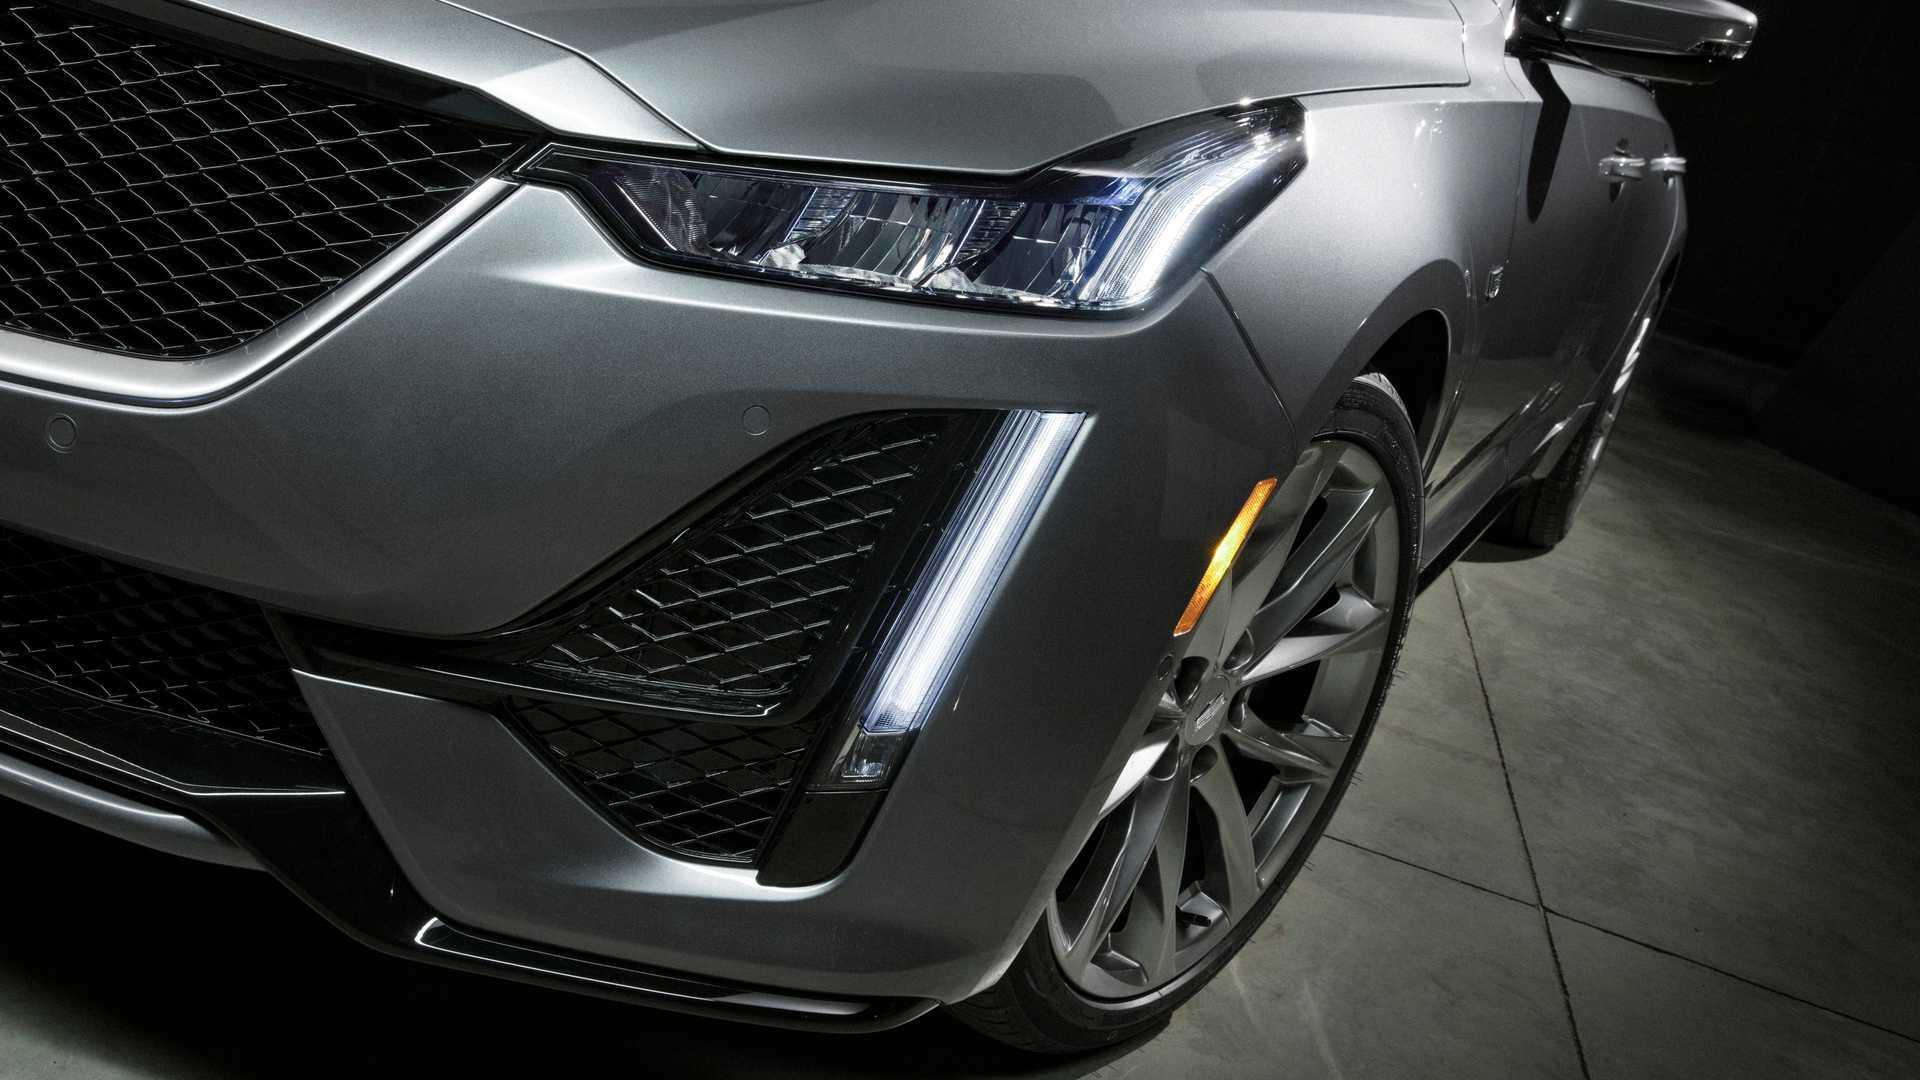 2020 Cadillac CT5 Headlight Wallpaper (3)